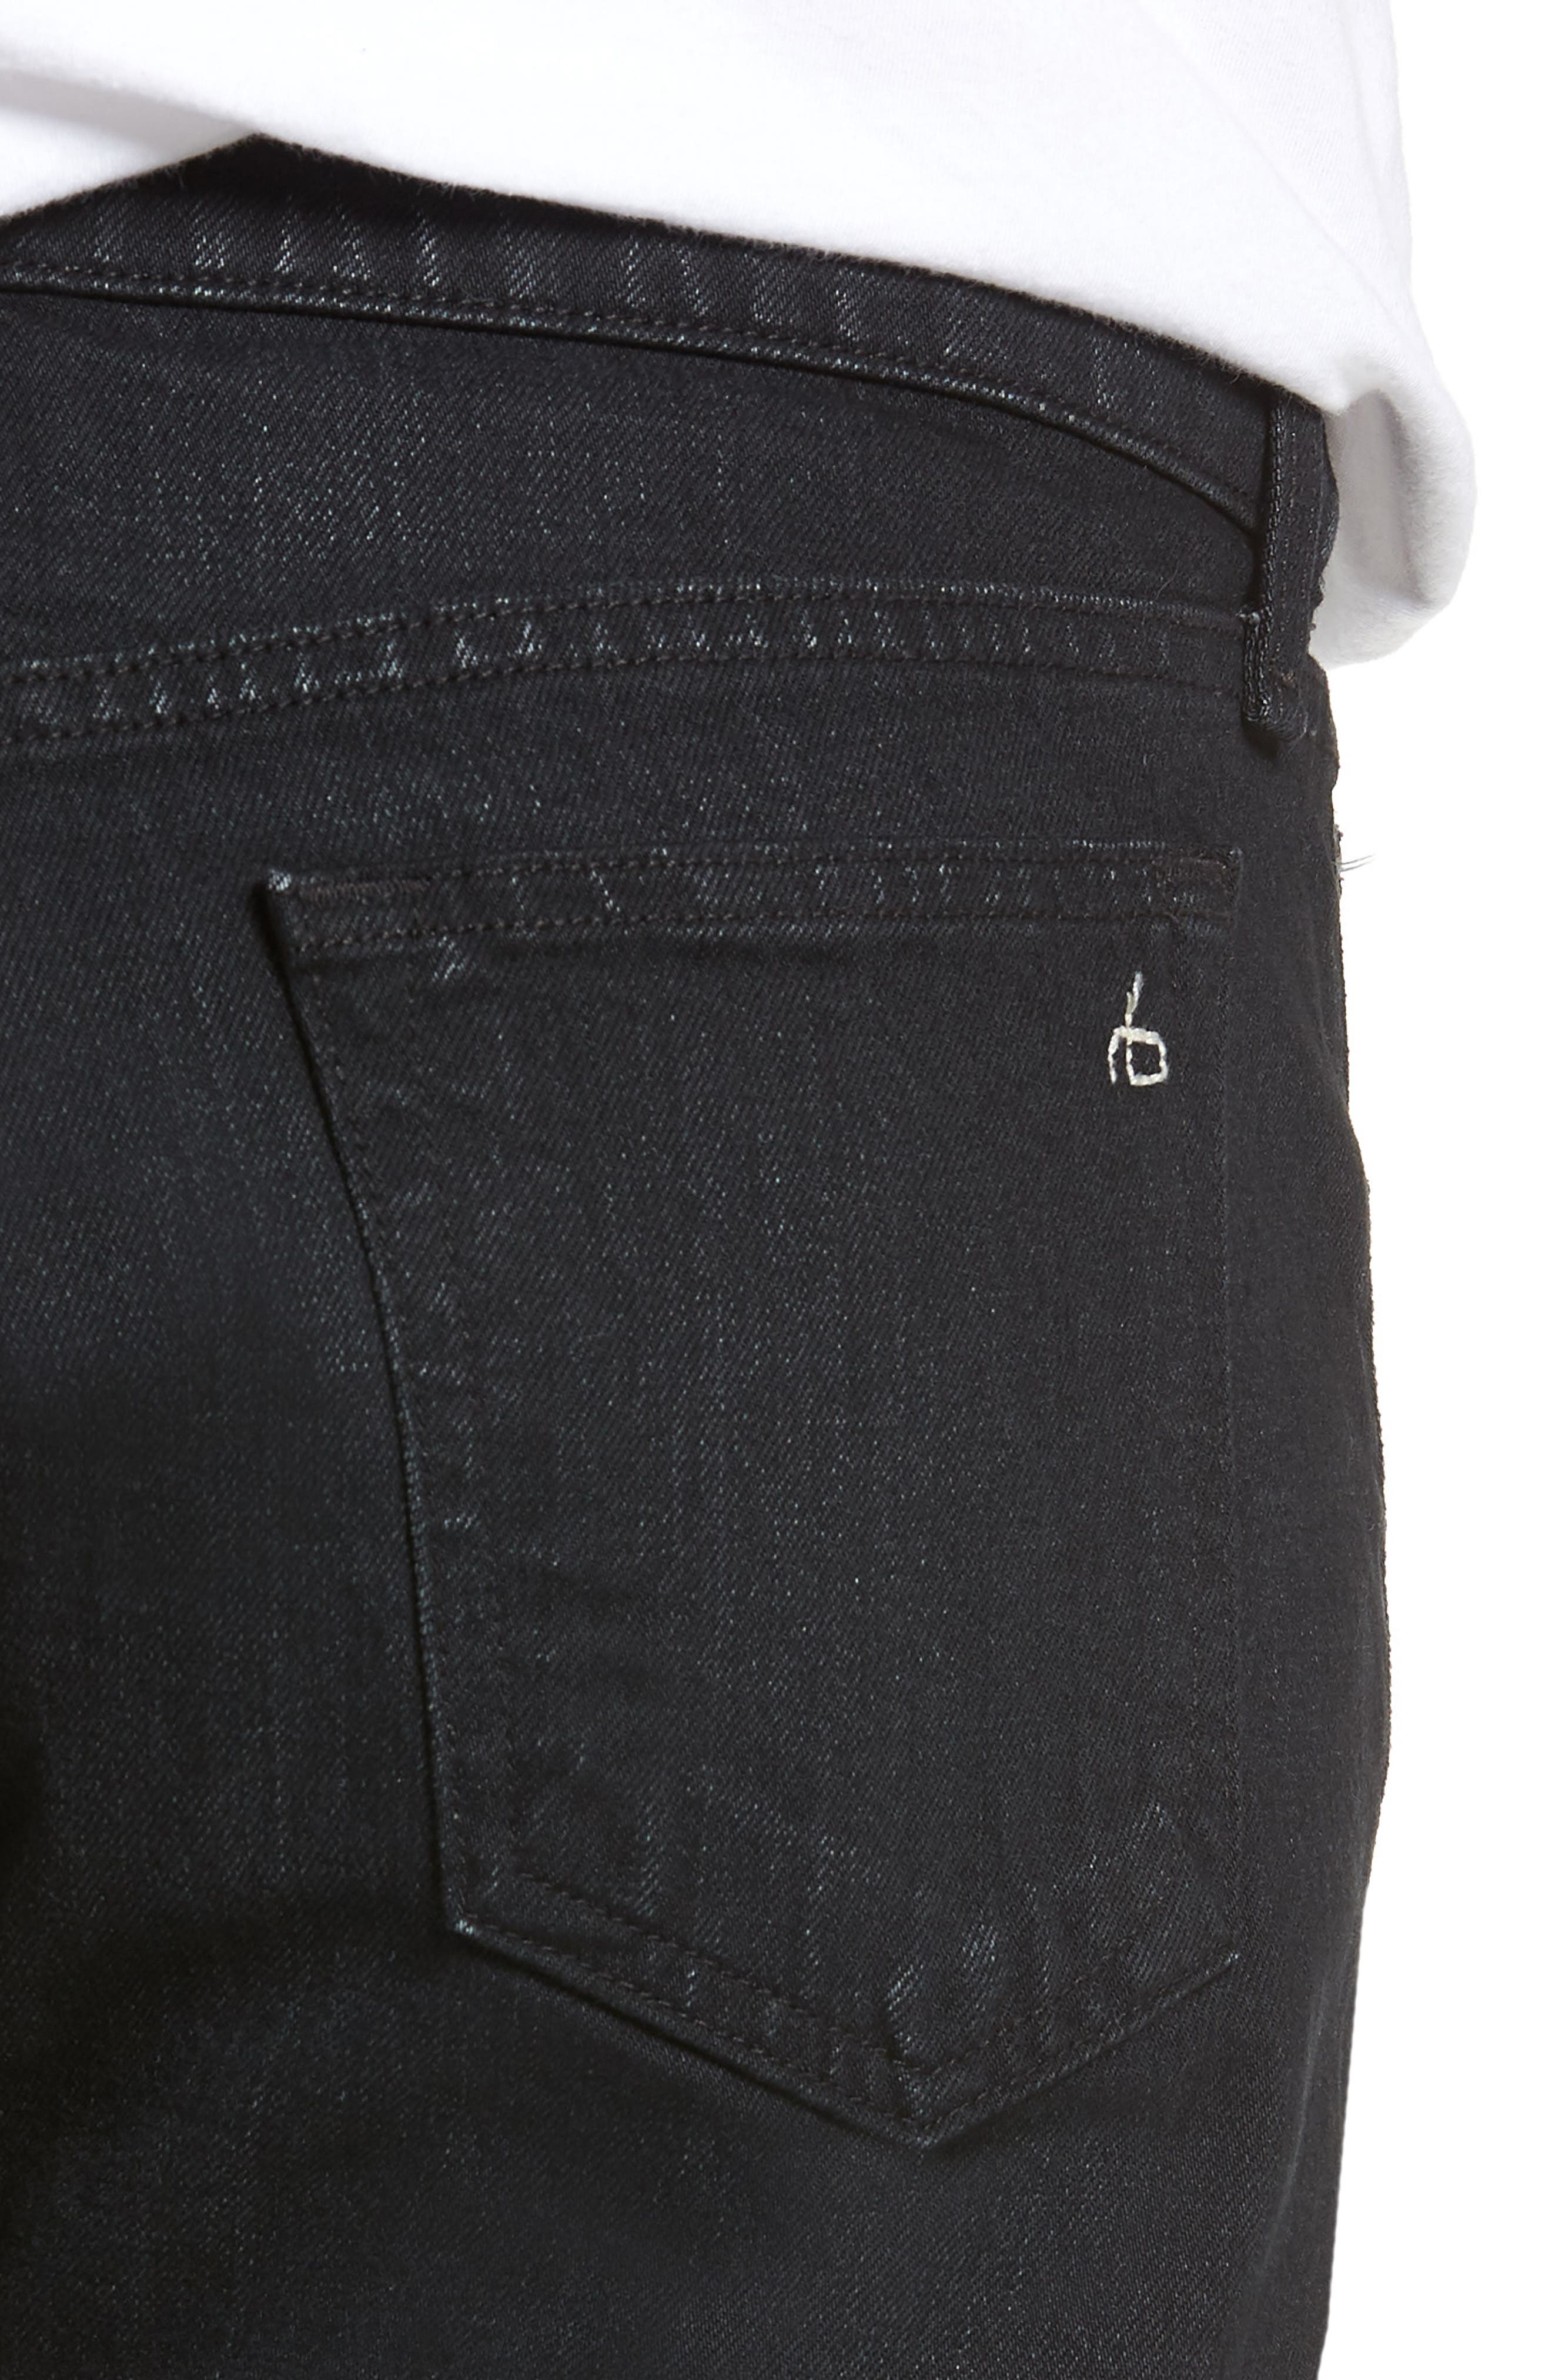 Fit 1 Skinny Fit Jeans,                             Alternate thumbnail 4, color,                             DEVON